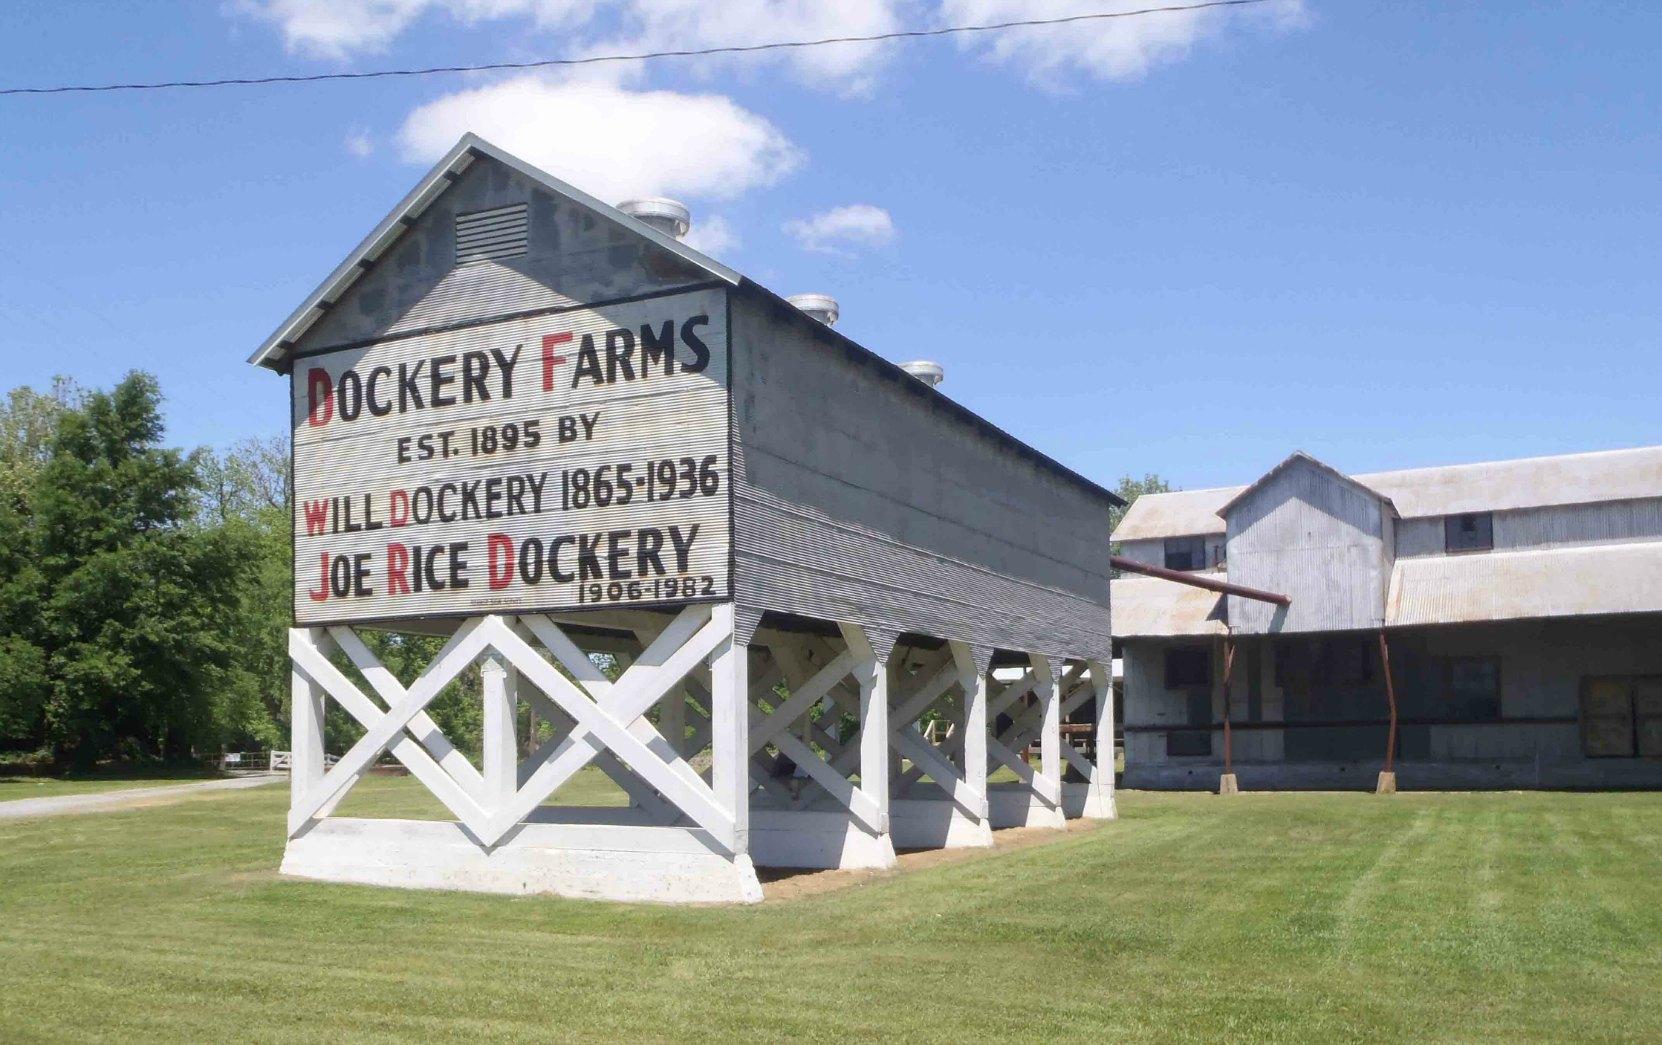 Dockery_Farm-sign-MississippiBluesTravellers-P5012168-1662x1245.jpg